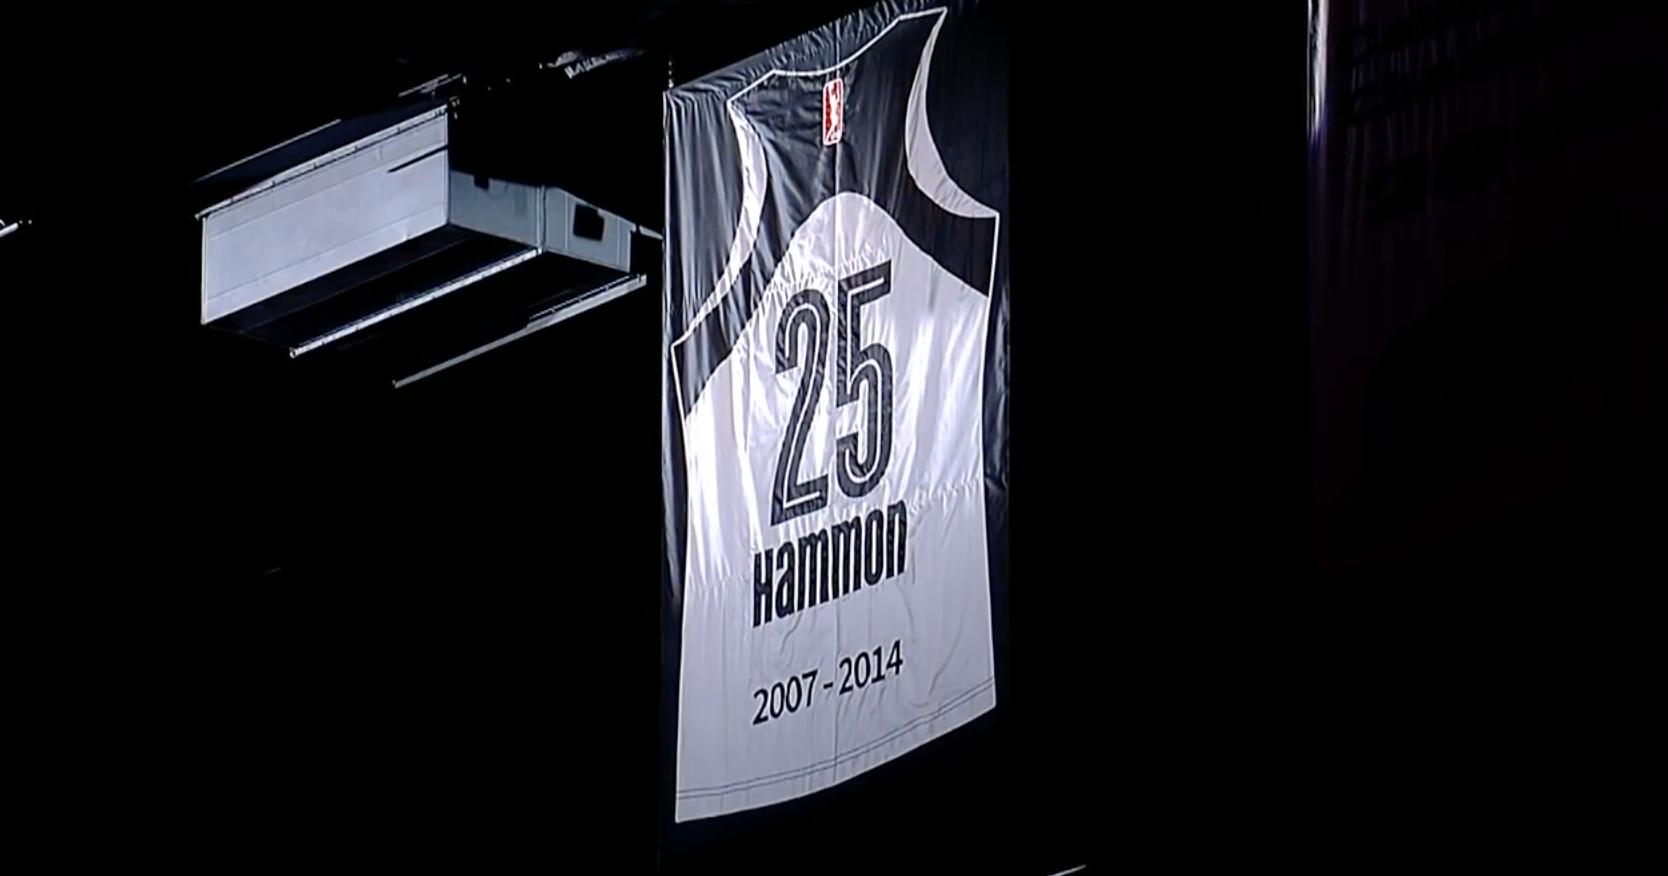 Becky Hammon's retired jersey